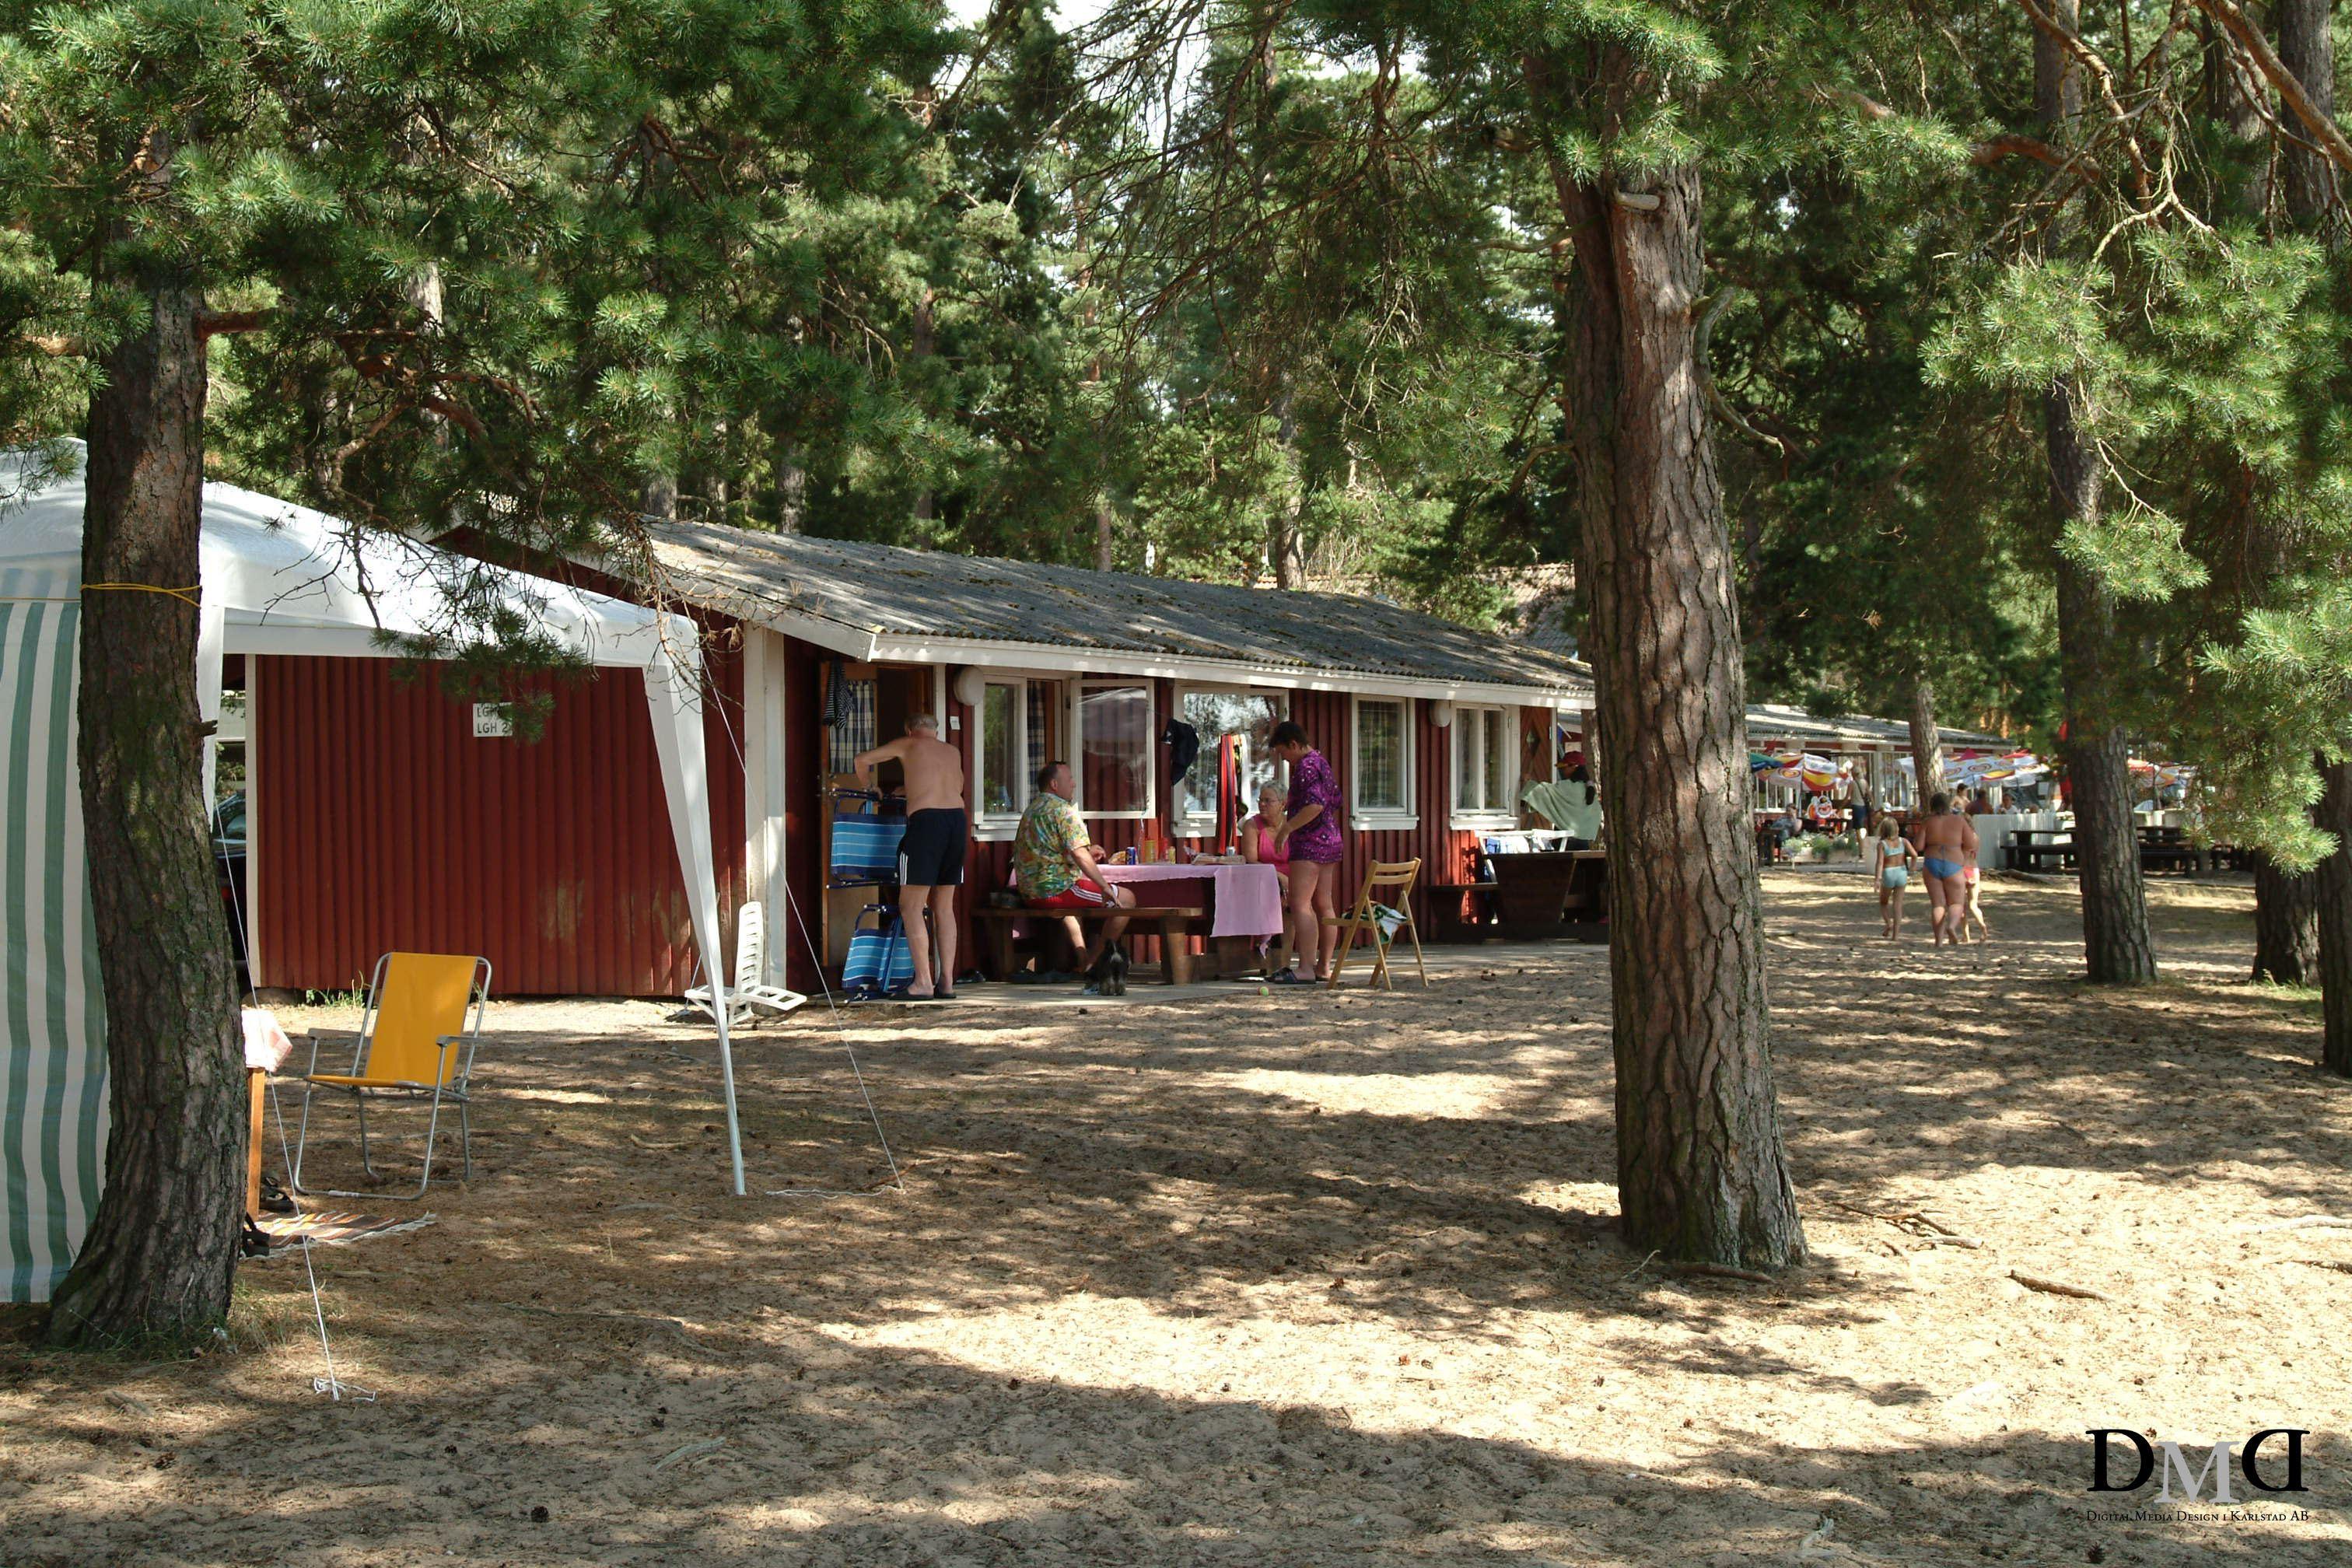 Swecamp Bomstadbaden / Camping